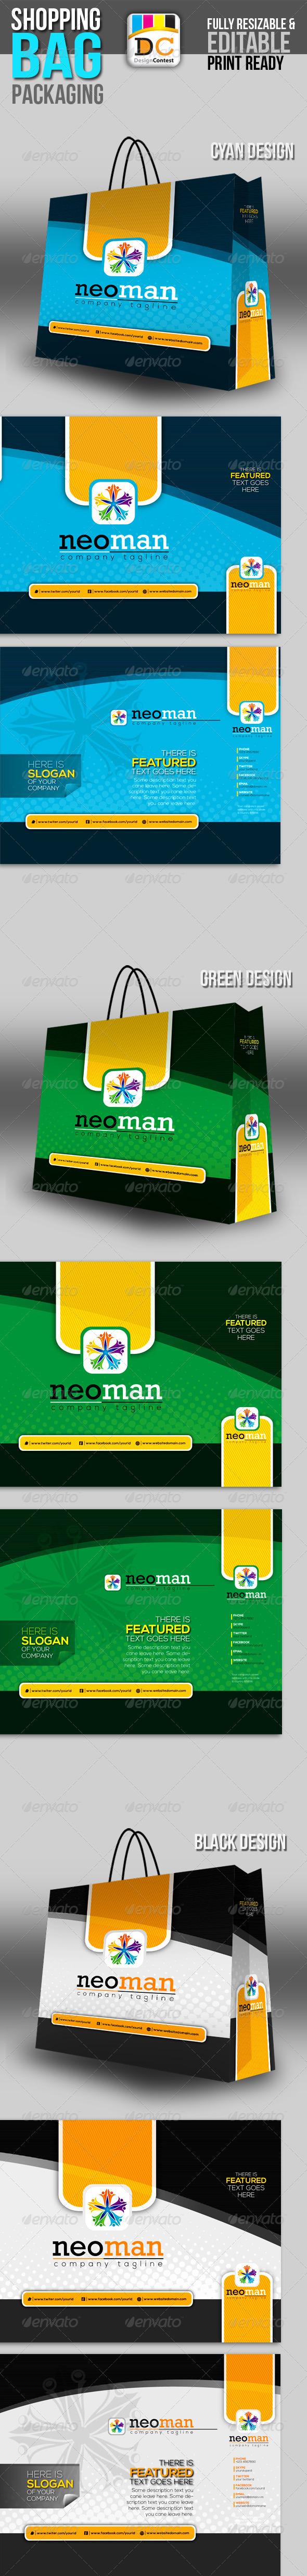 Neo Man Shopping Bag Packaging - Packaging Print Templates